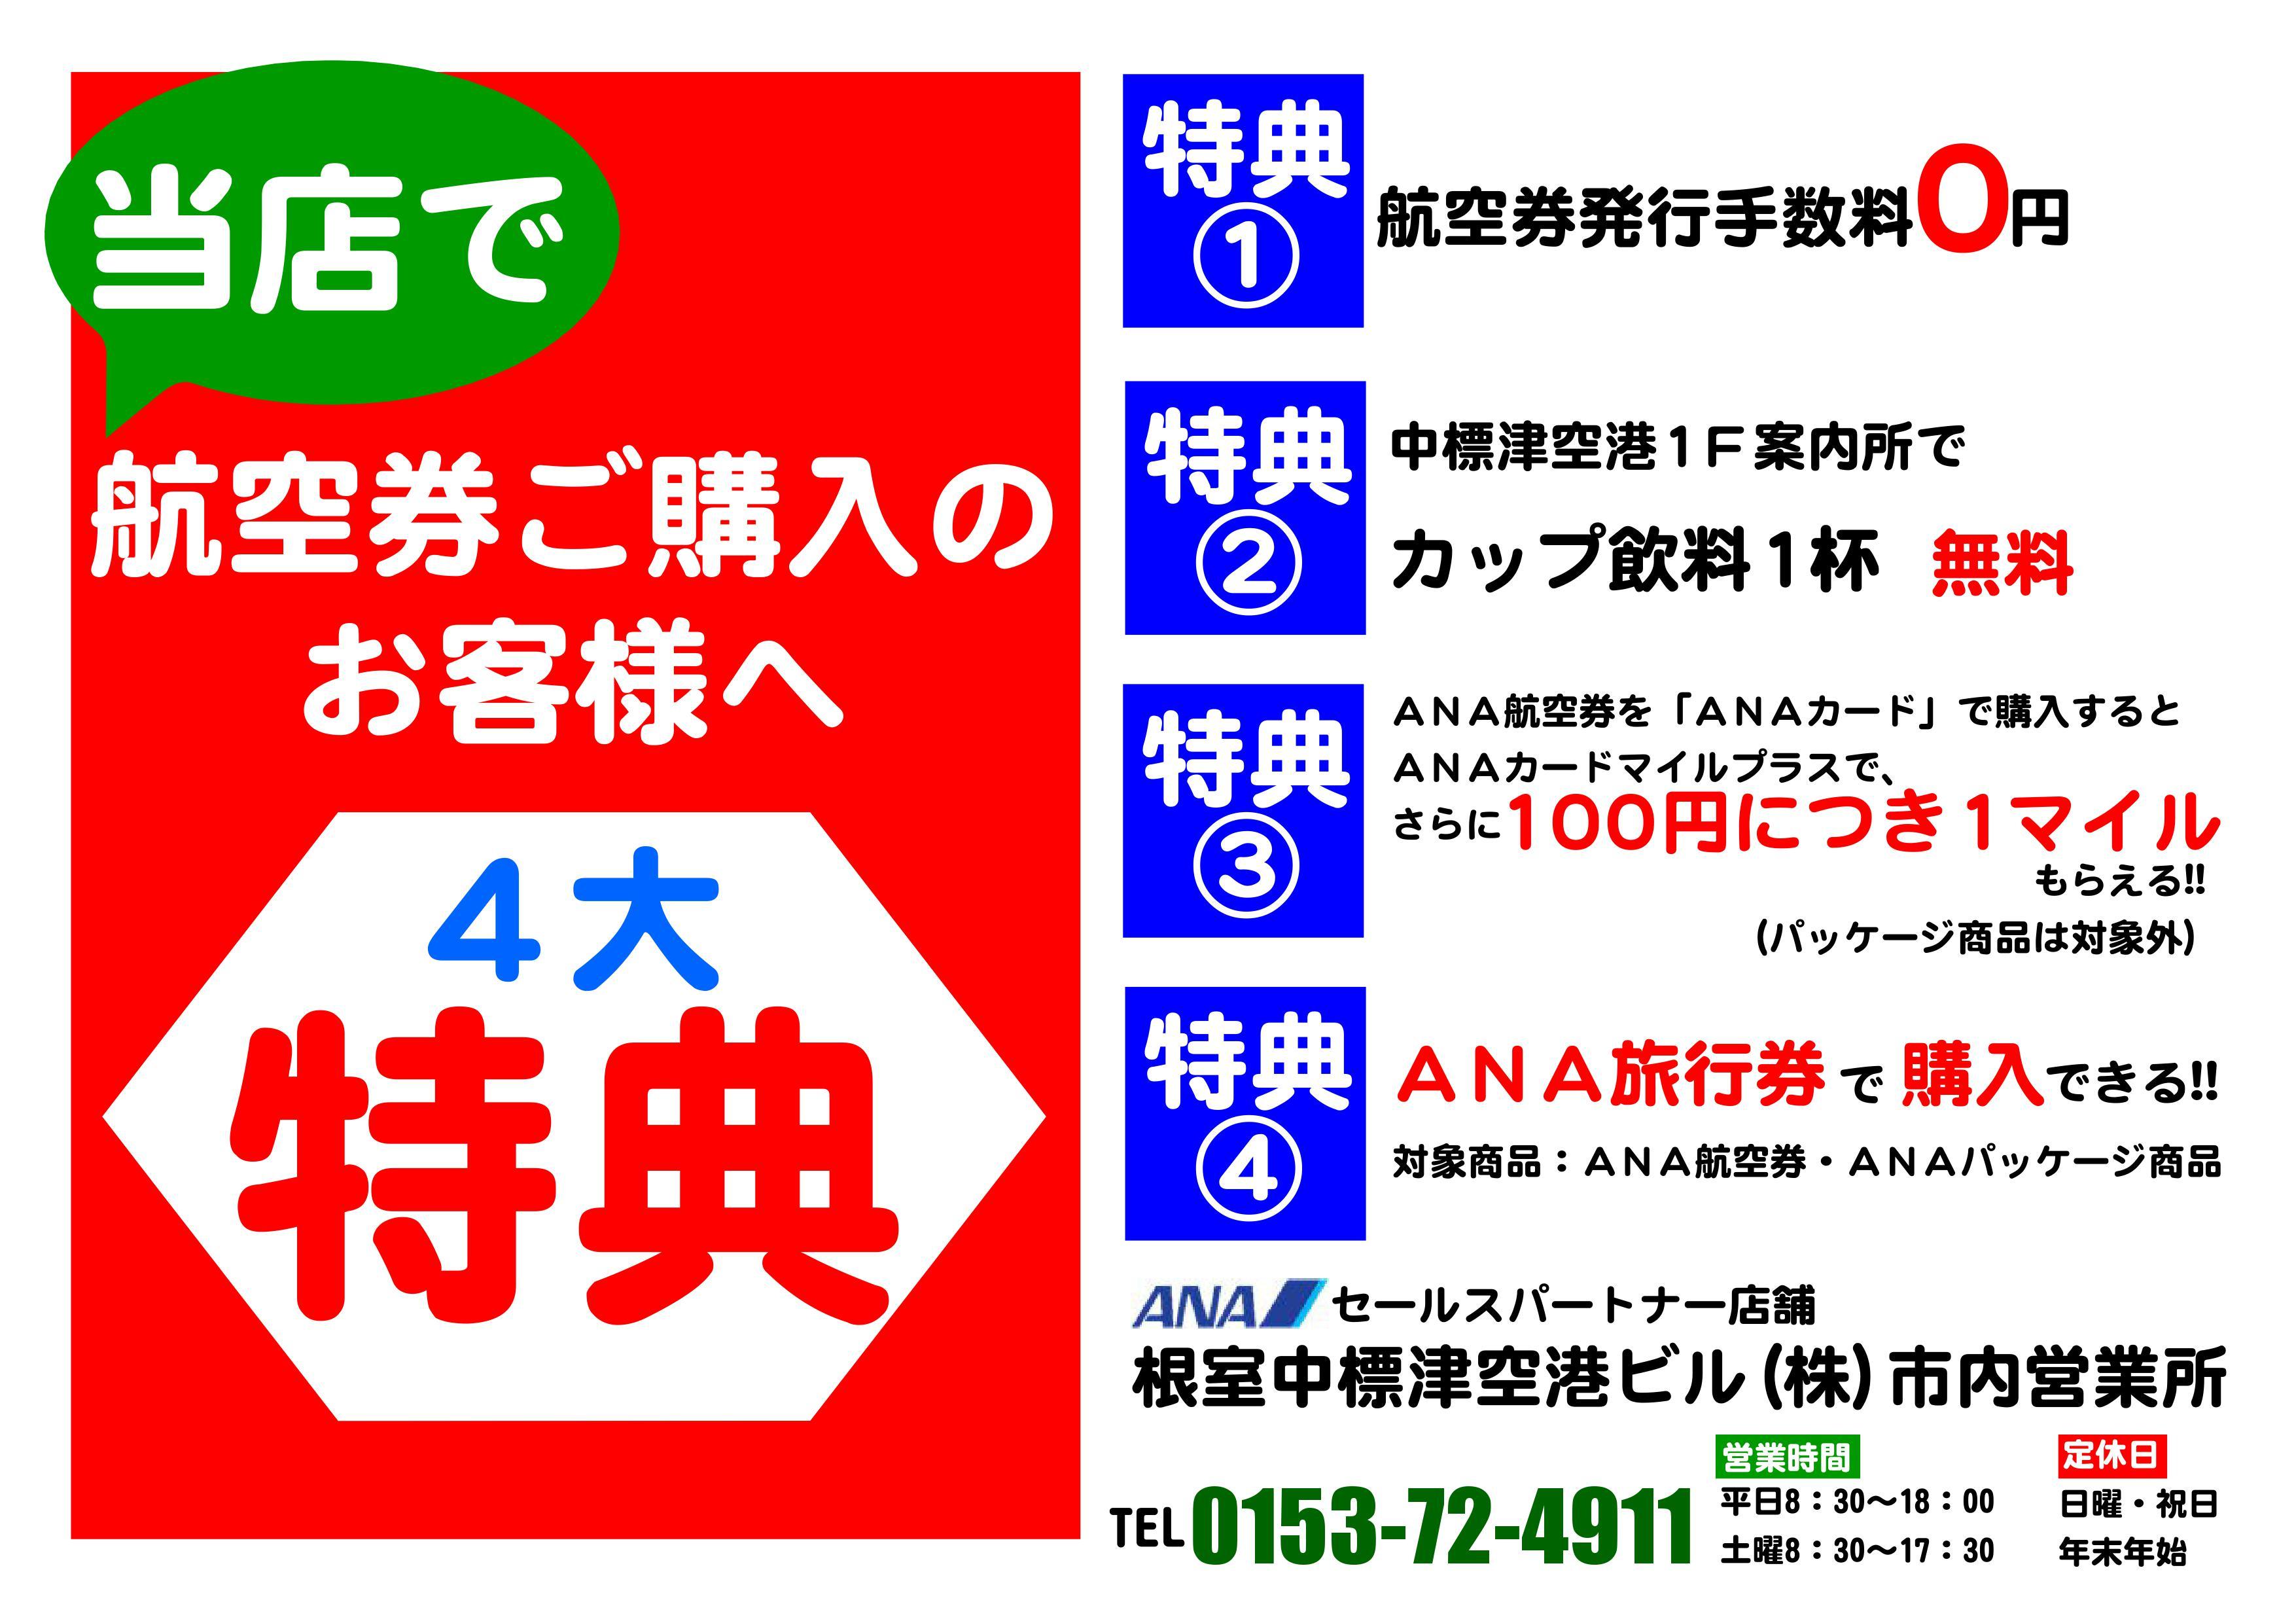 http://www.nakashibetsu-airport.jp/%E7%89%B9%E5%85%B8%E5%86%85%E5%AE%B9.jpg